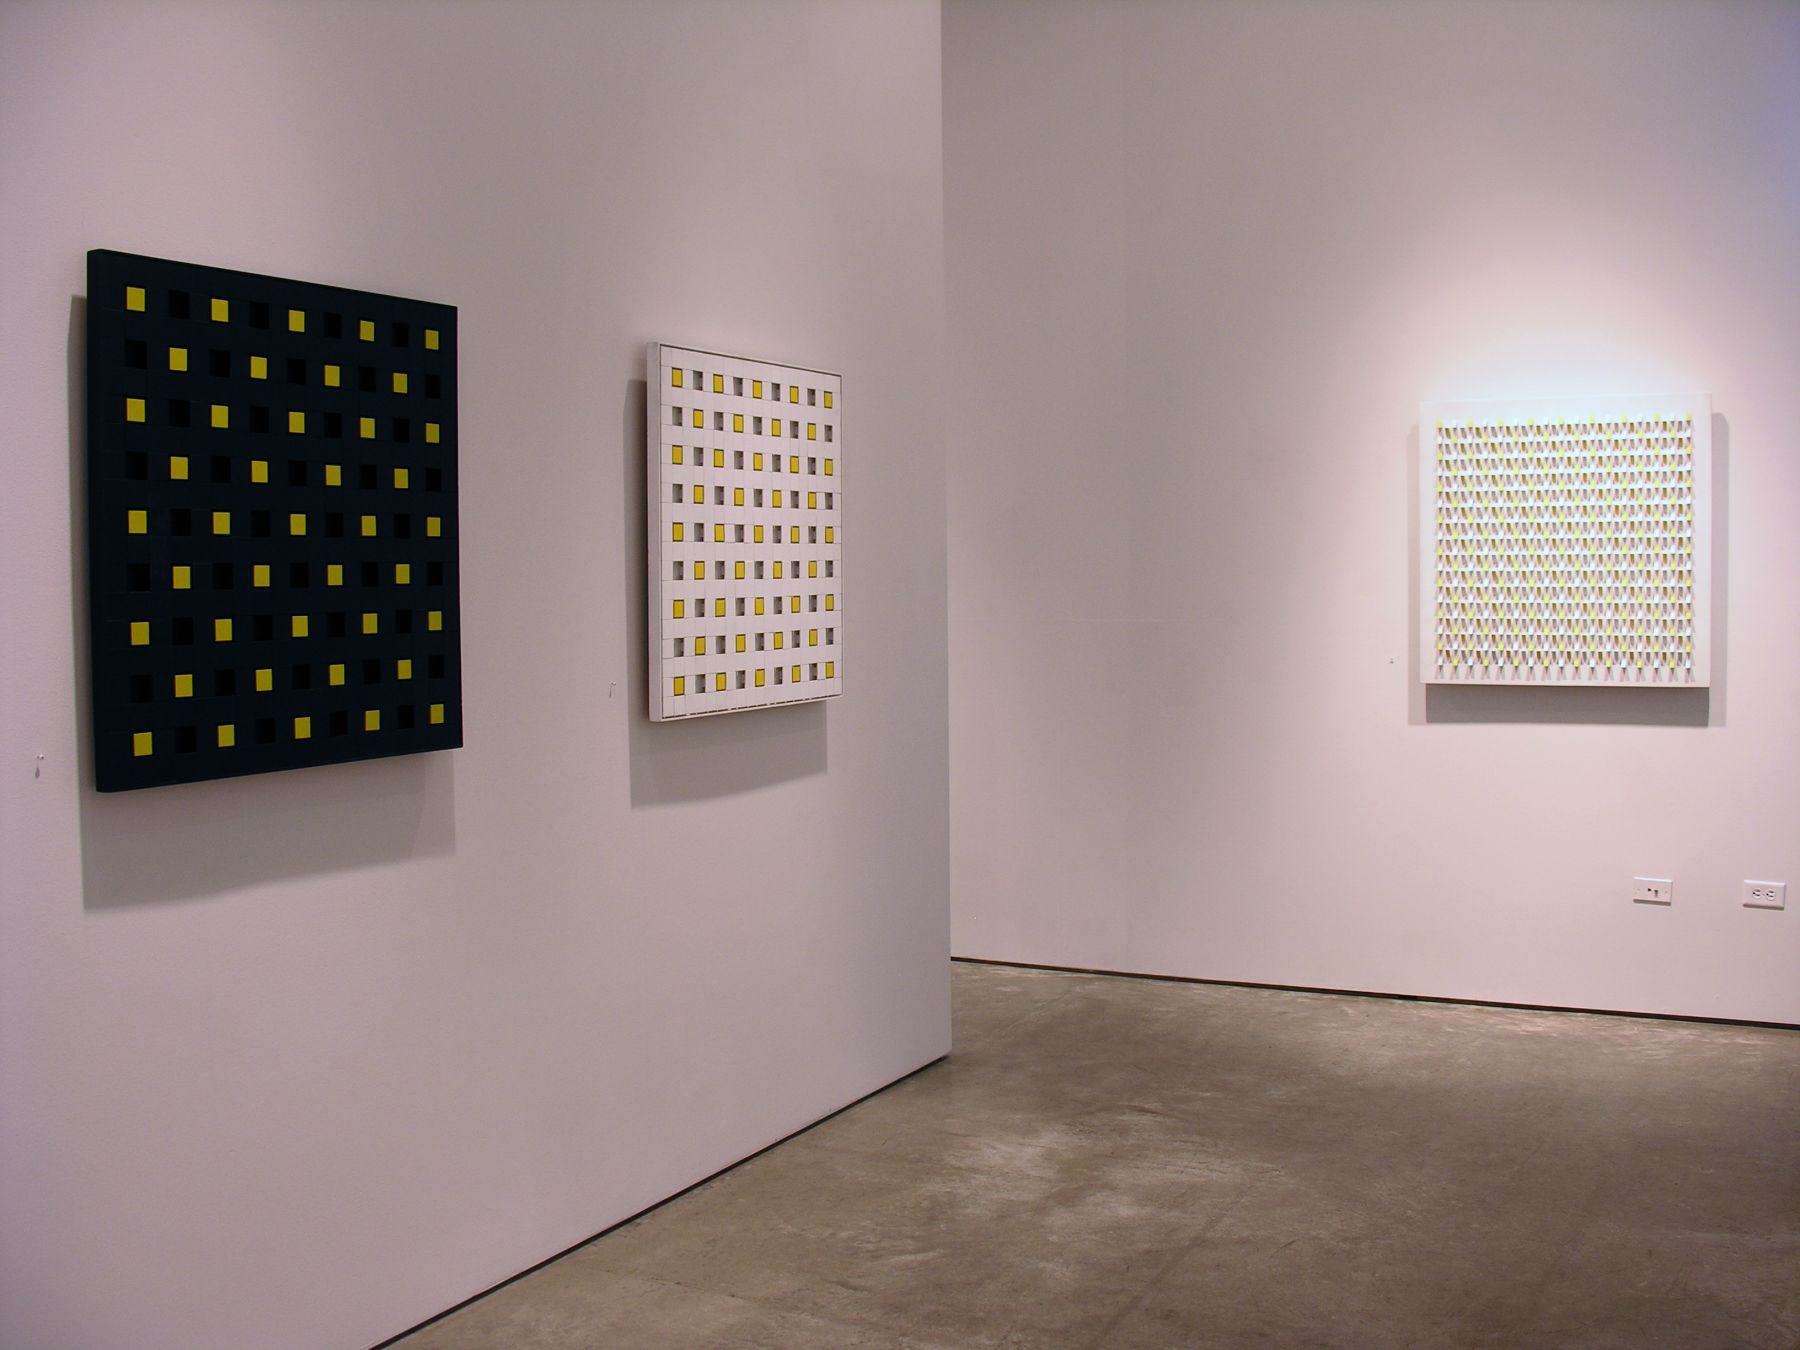 Luis Tomasello, Exhibition at Sicardi | Ayers | Bacino, 2007